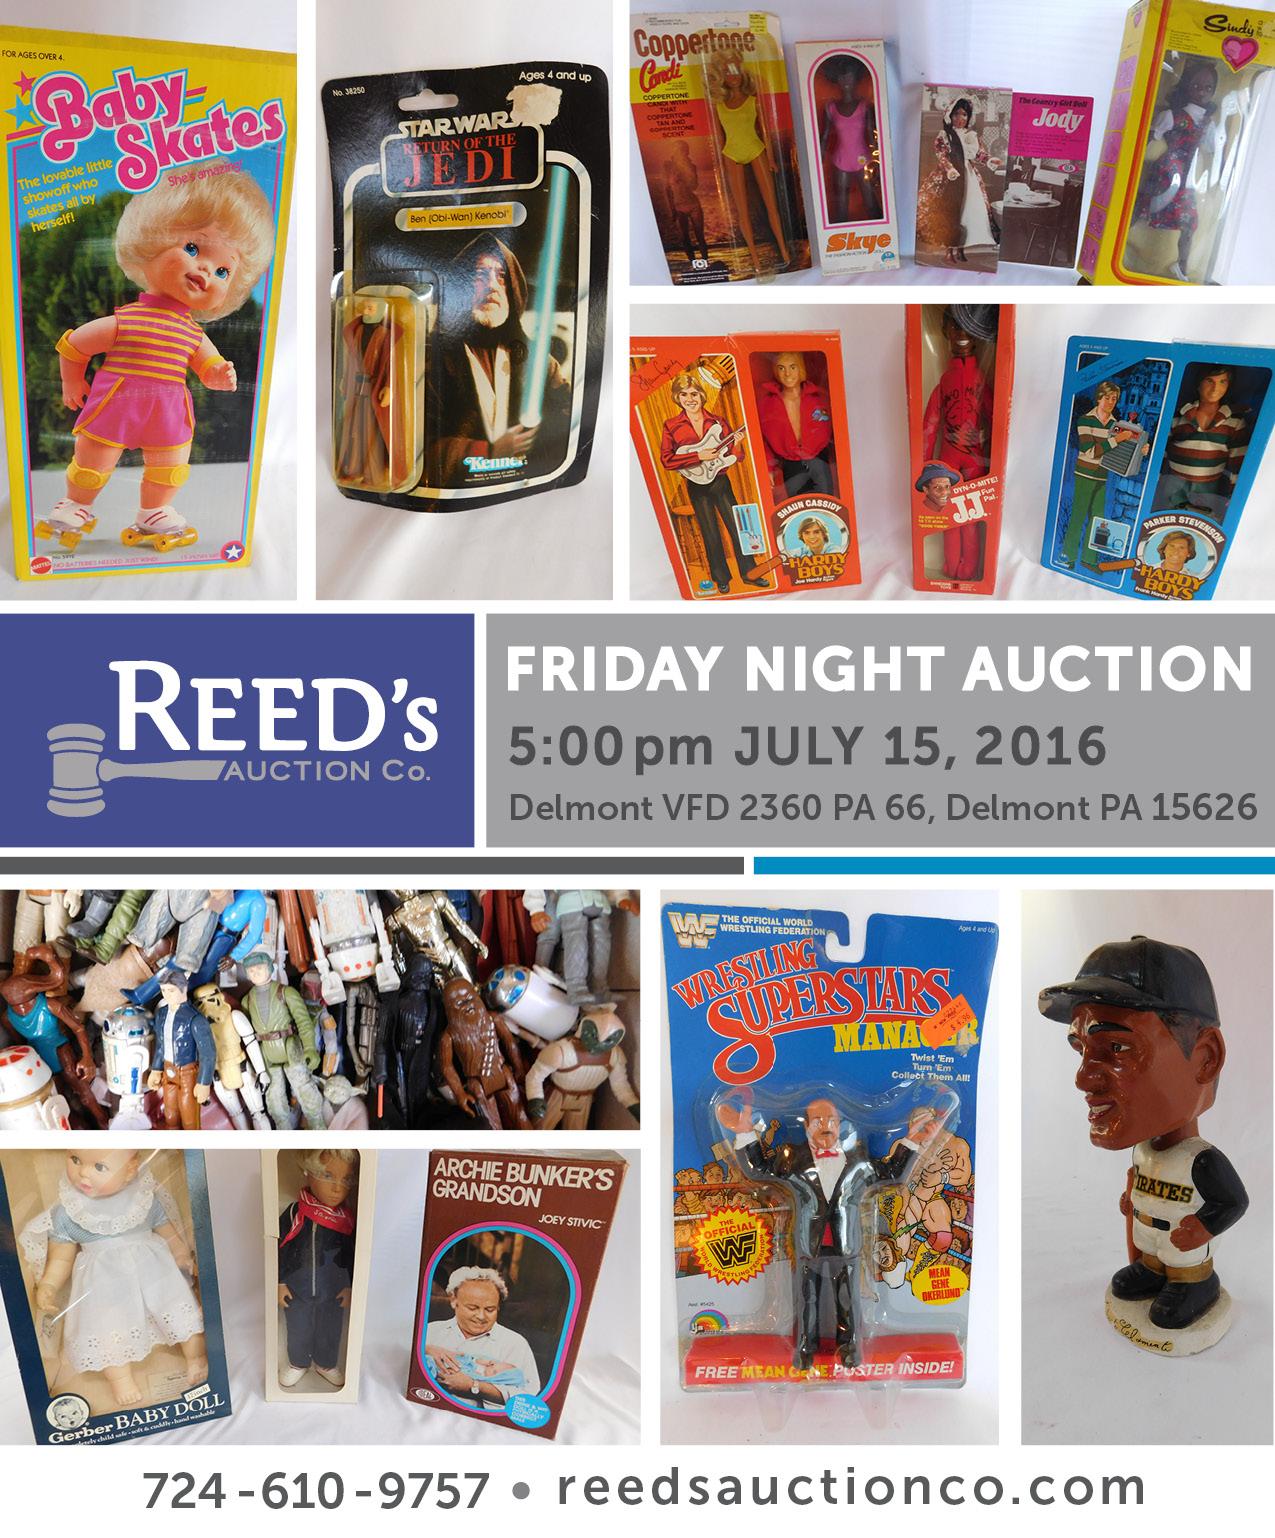 FB Auction Flyer 7-15-16.jpg